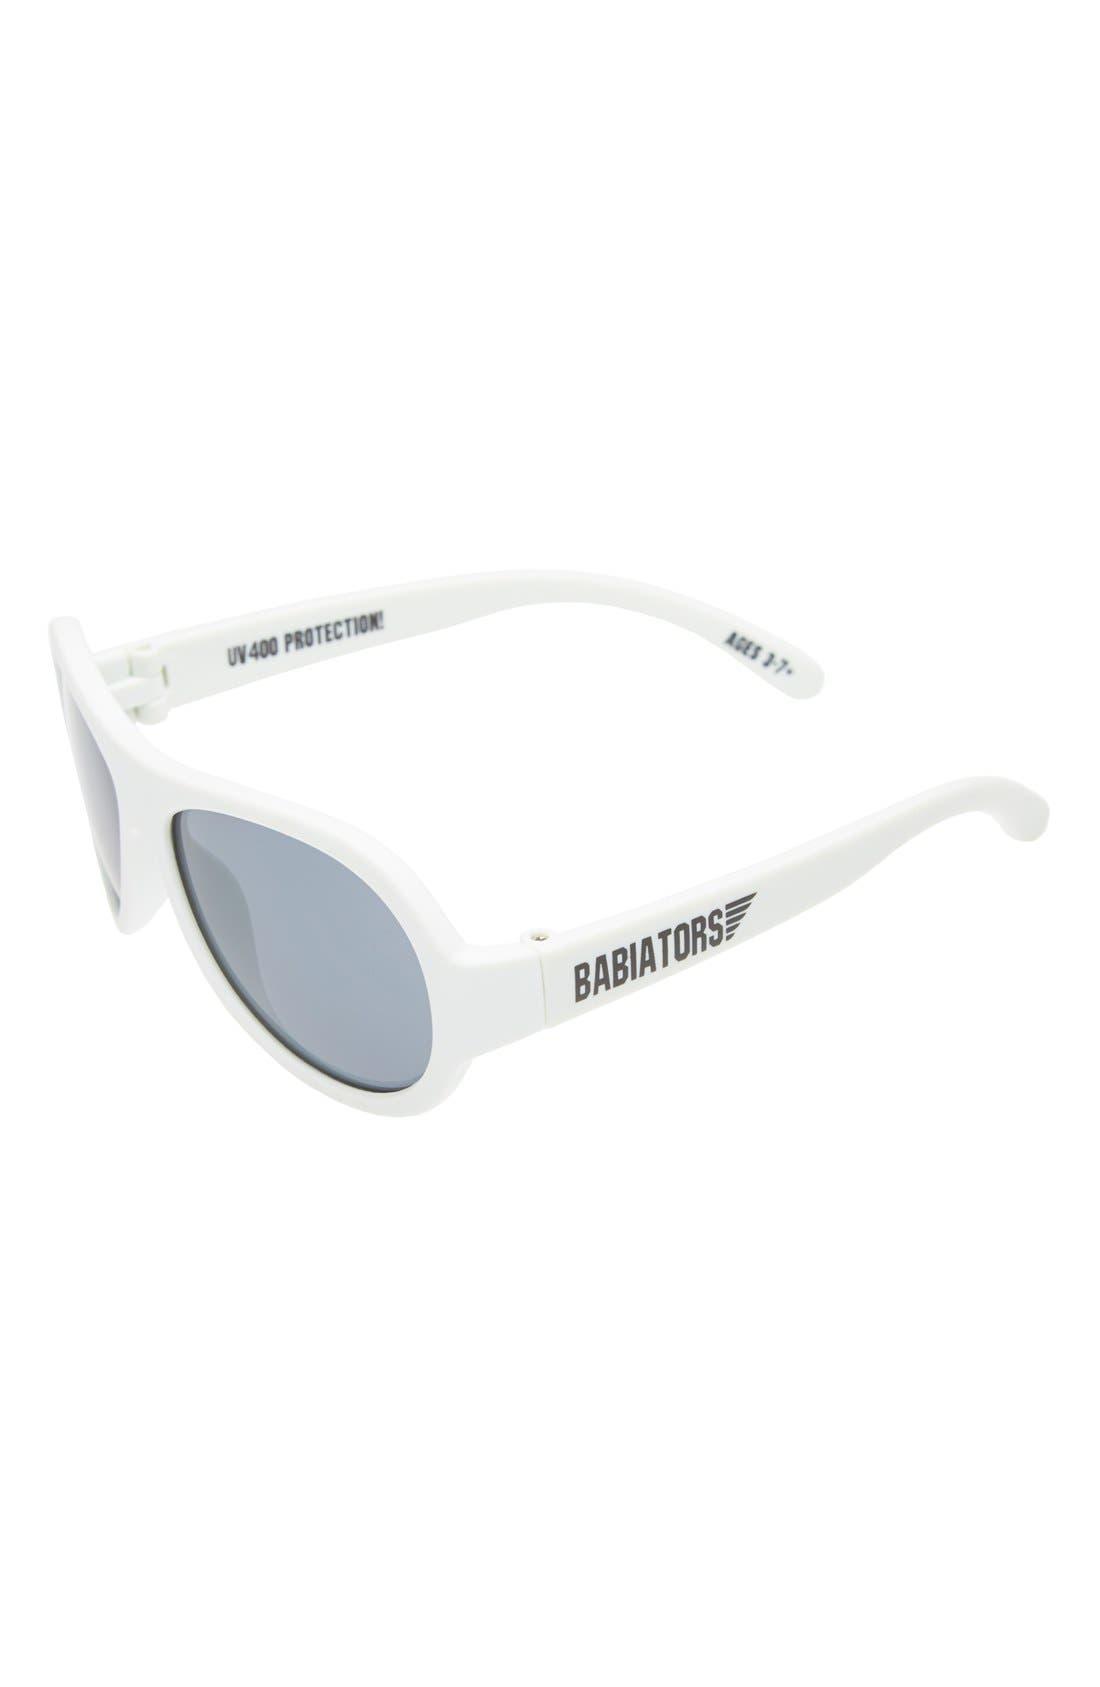 Main Image - Babiators 'Black Ops' Sunglasses (Little Kid)